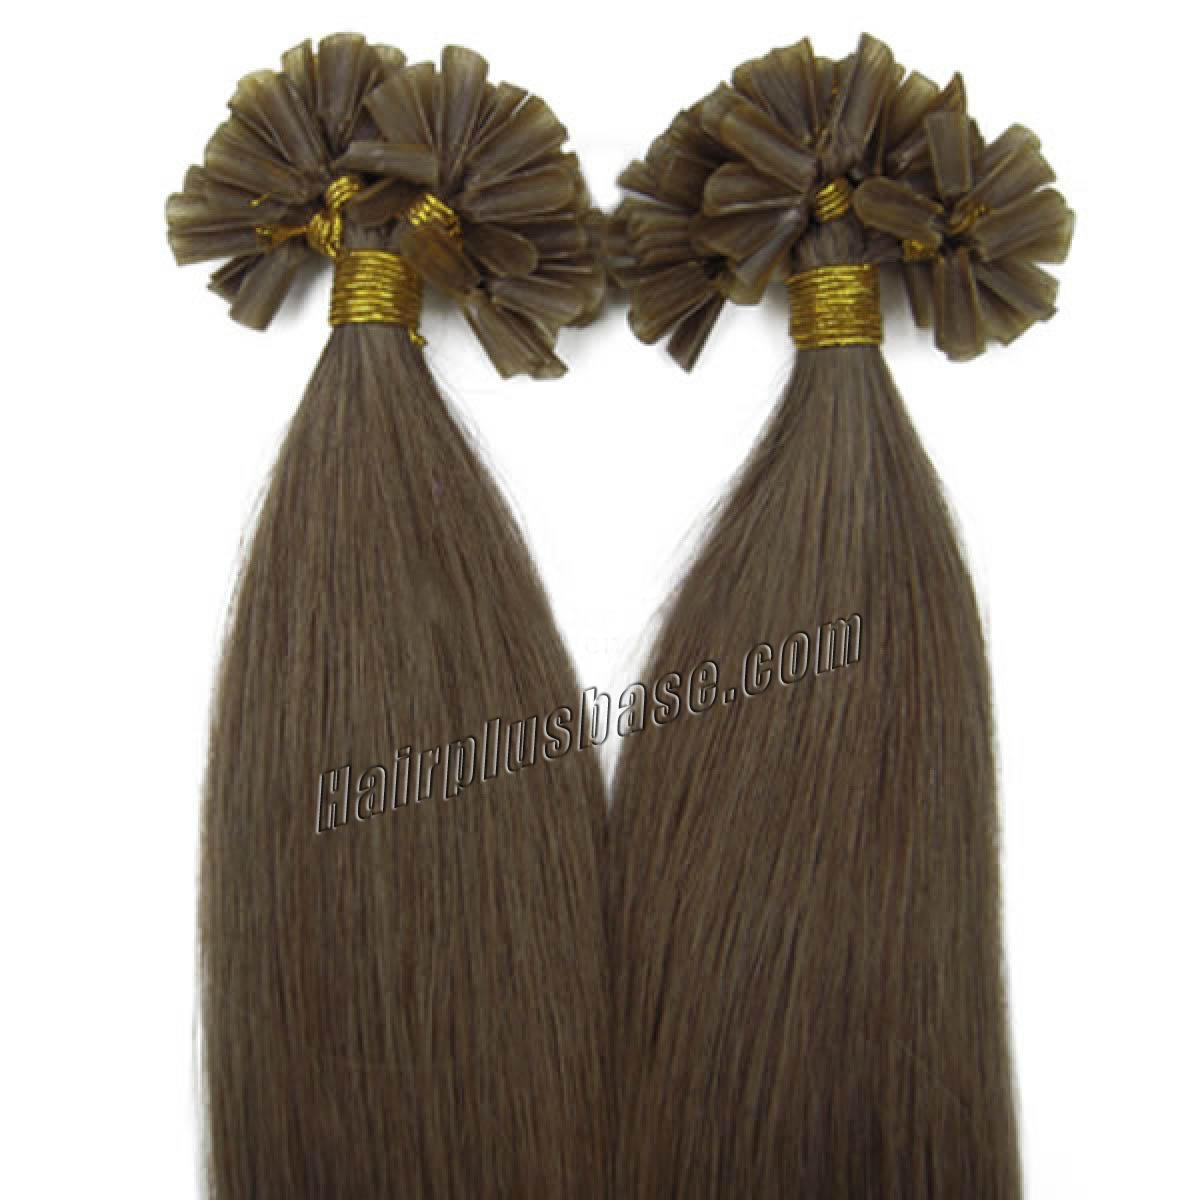 22 Inch 8 Ash Brown Nail Tip Human Hair Extensions 100s